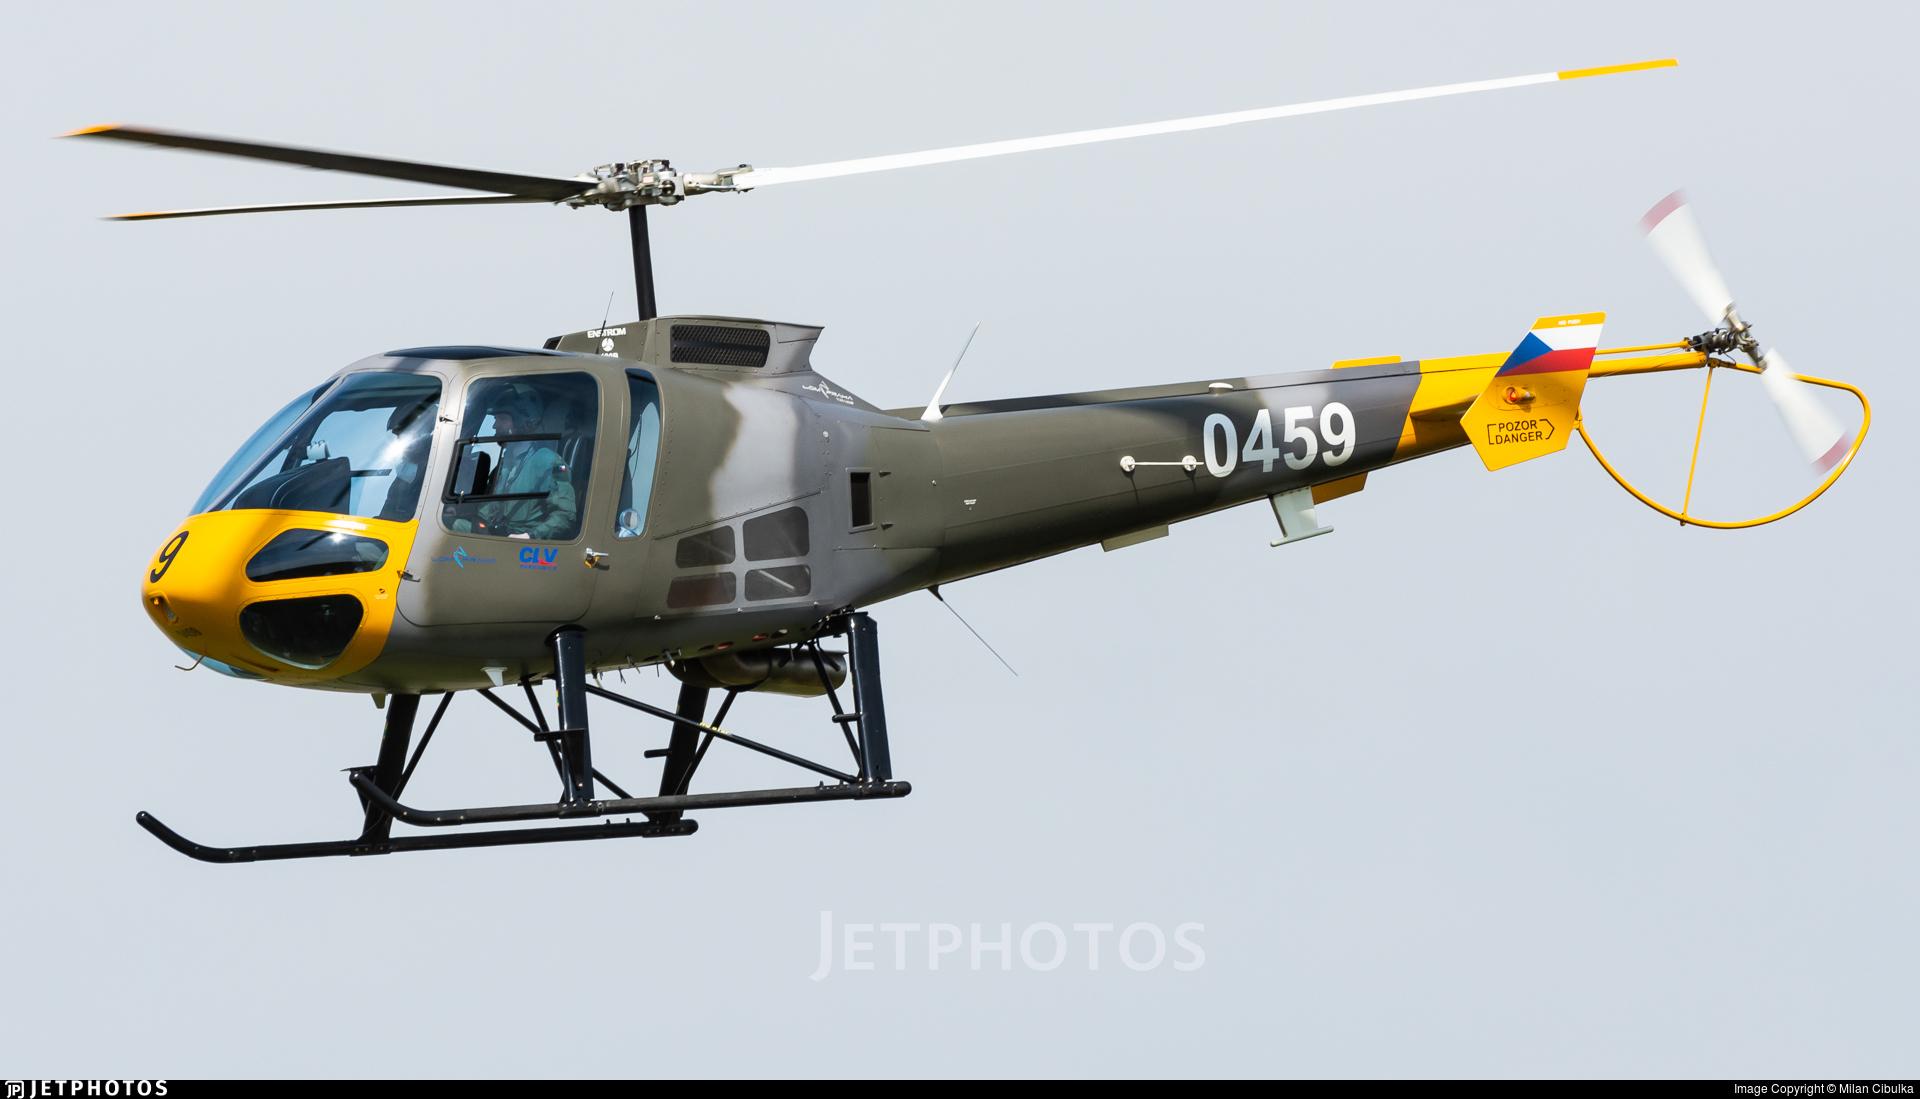 0459 - Enstrom 480B - Czech Republic - Air Force